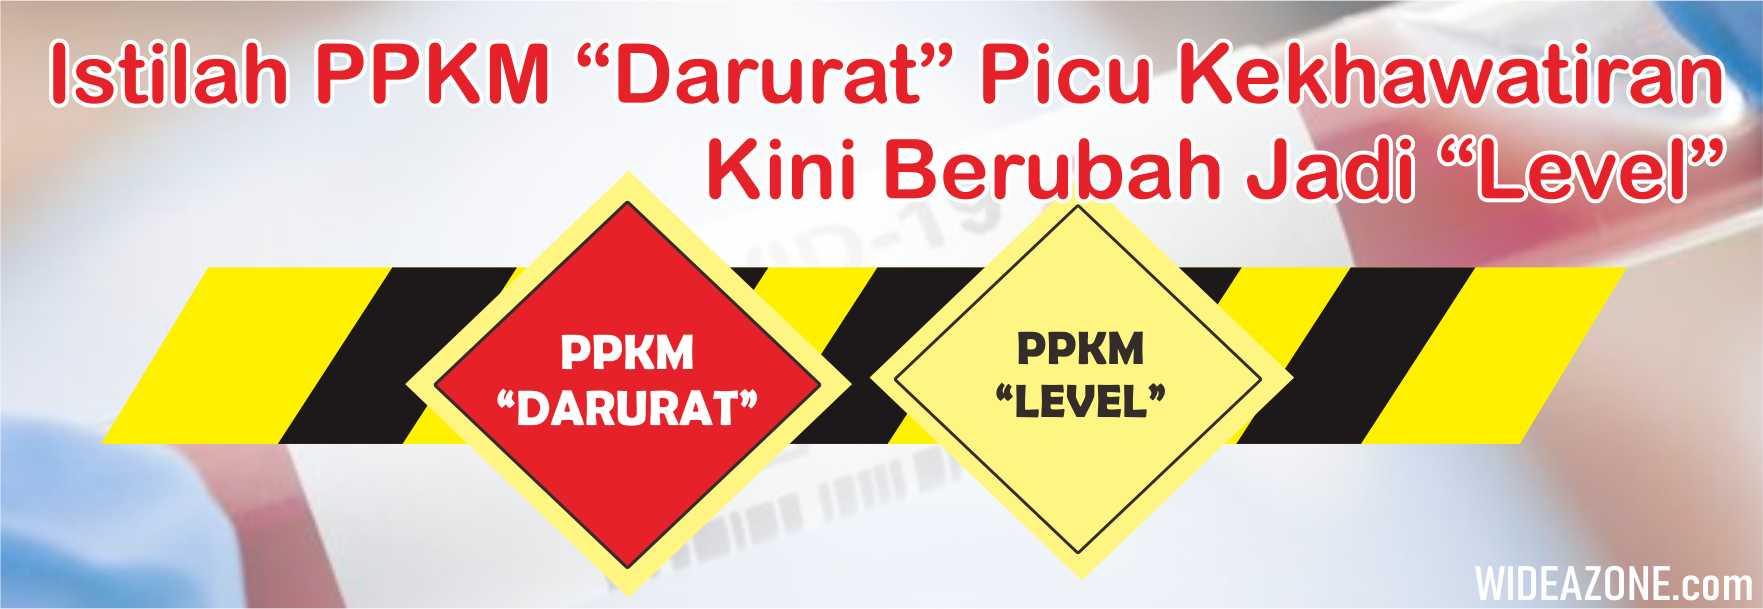 Ilustrasi PPKM Darurat-Level